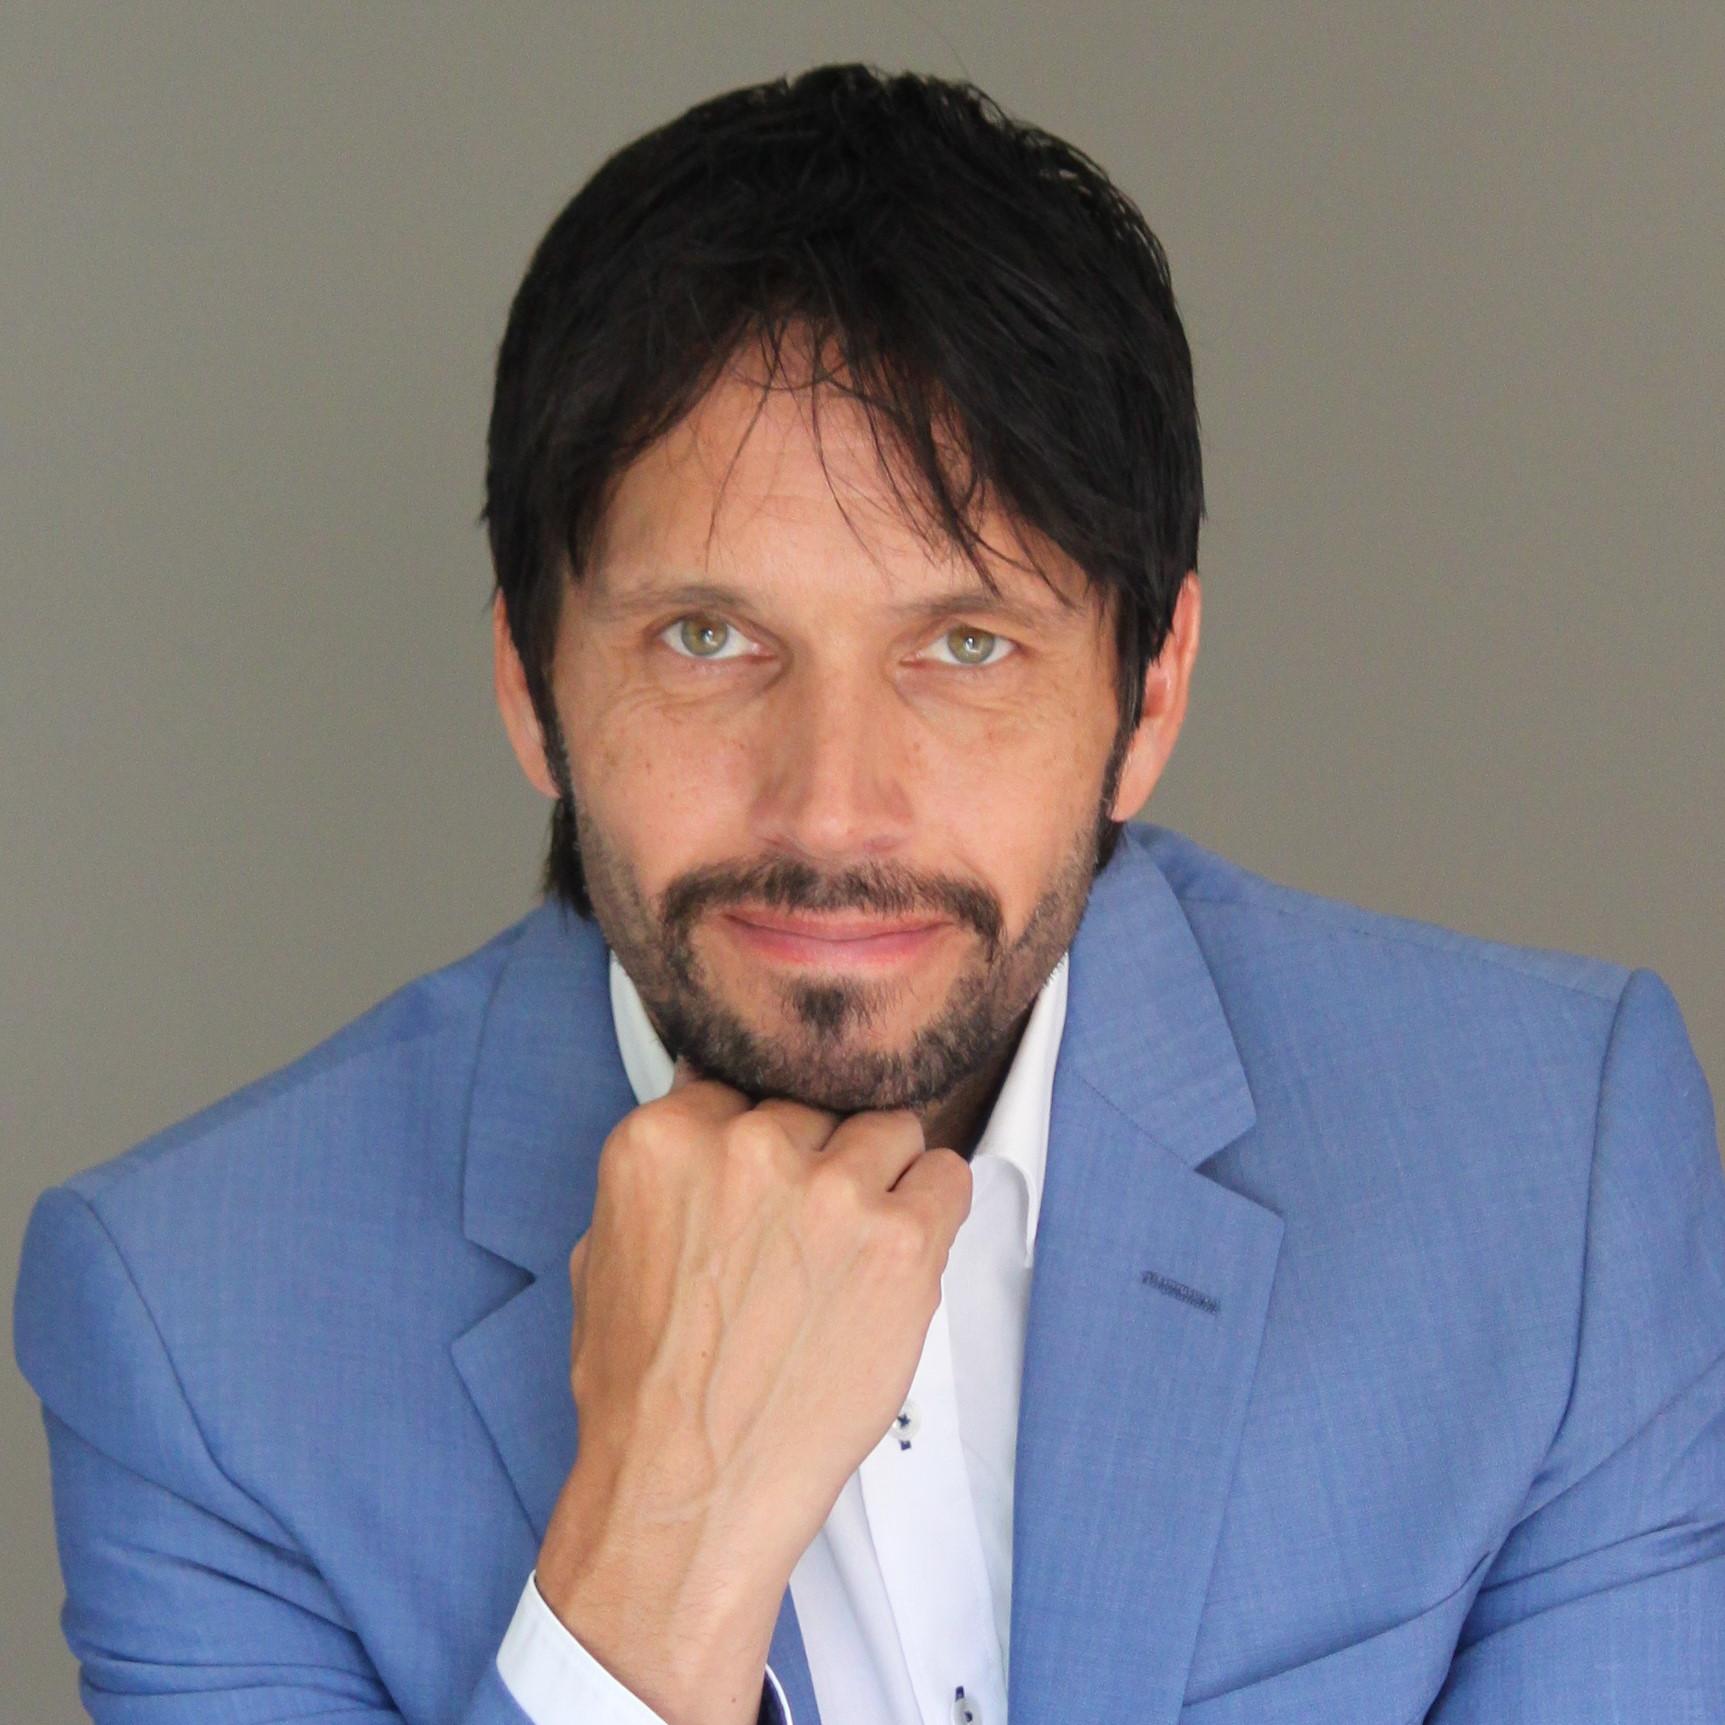 Alexander Fussan, Finanzcontrolling & Business Analyst at Berliner Sparkasse